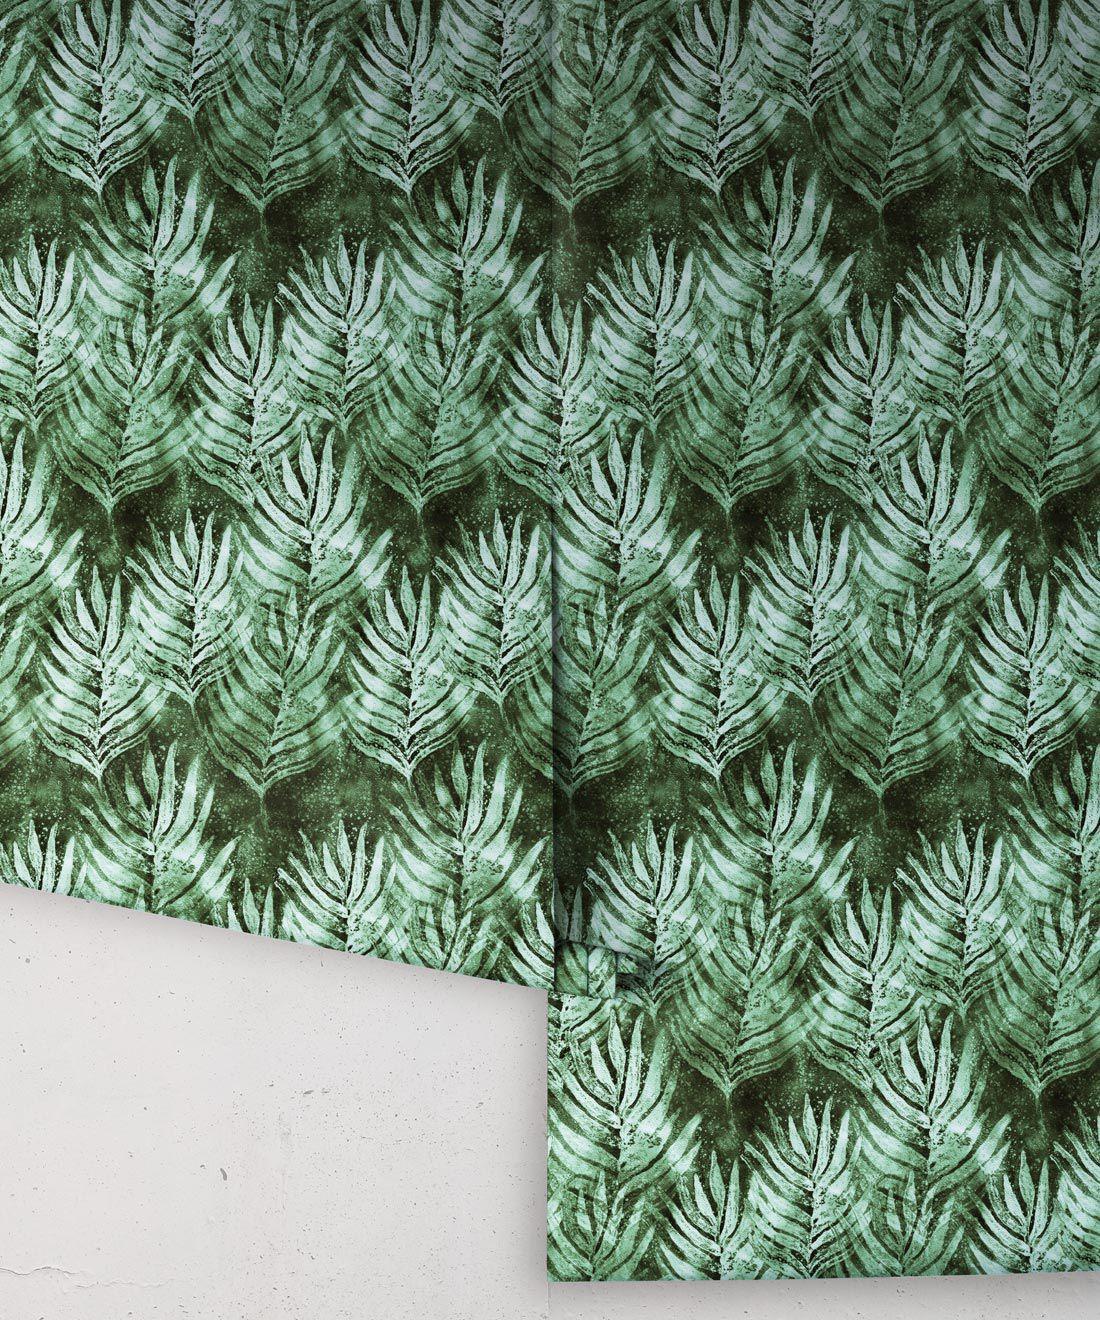 Rainforest Green Shibori Leaf Wallpaper